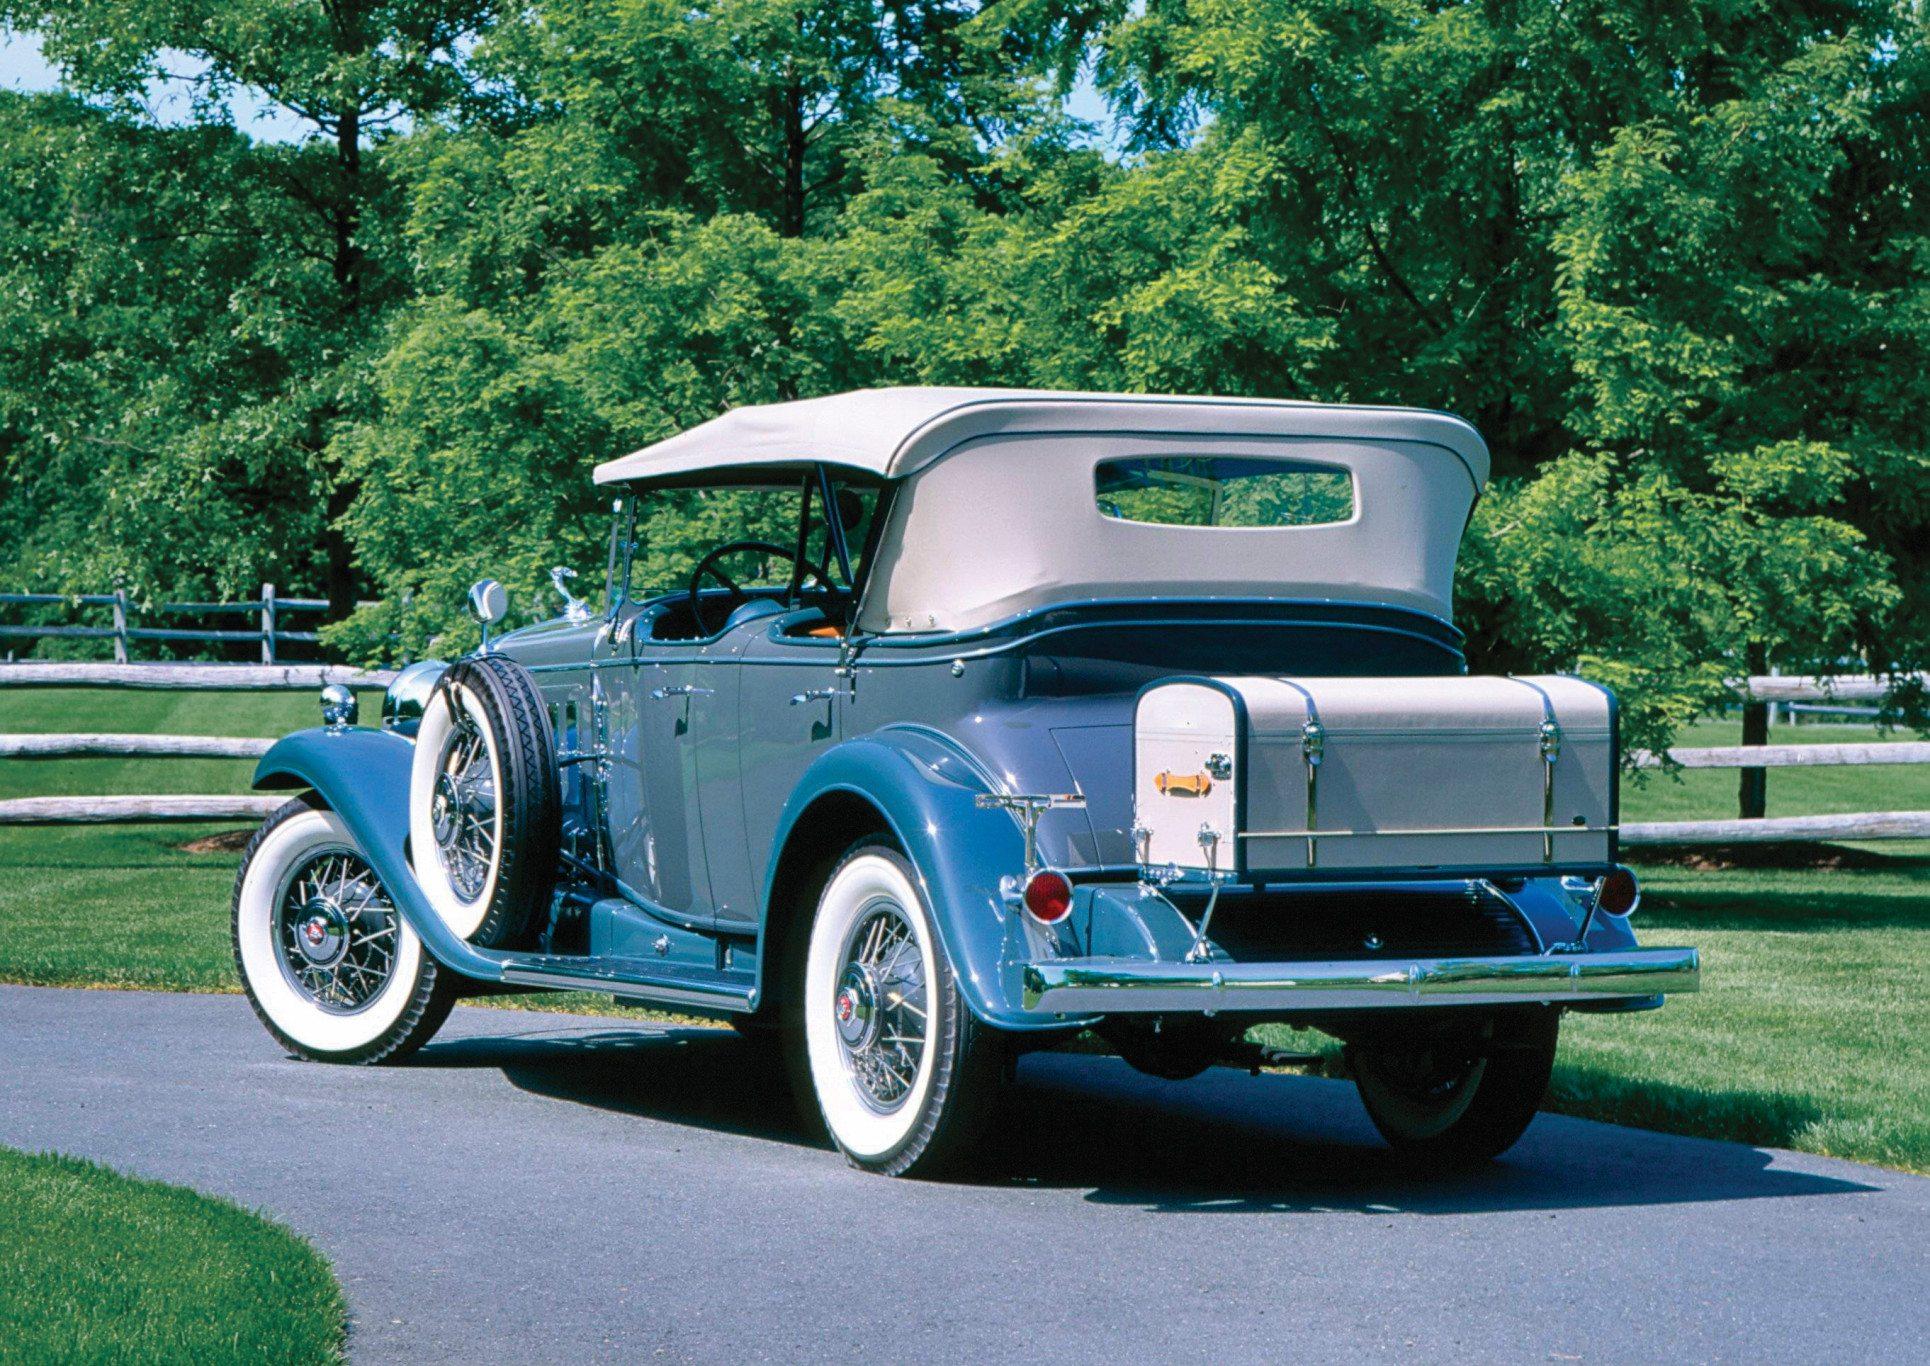 1930 Cadillac Sport Phaeton Rear